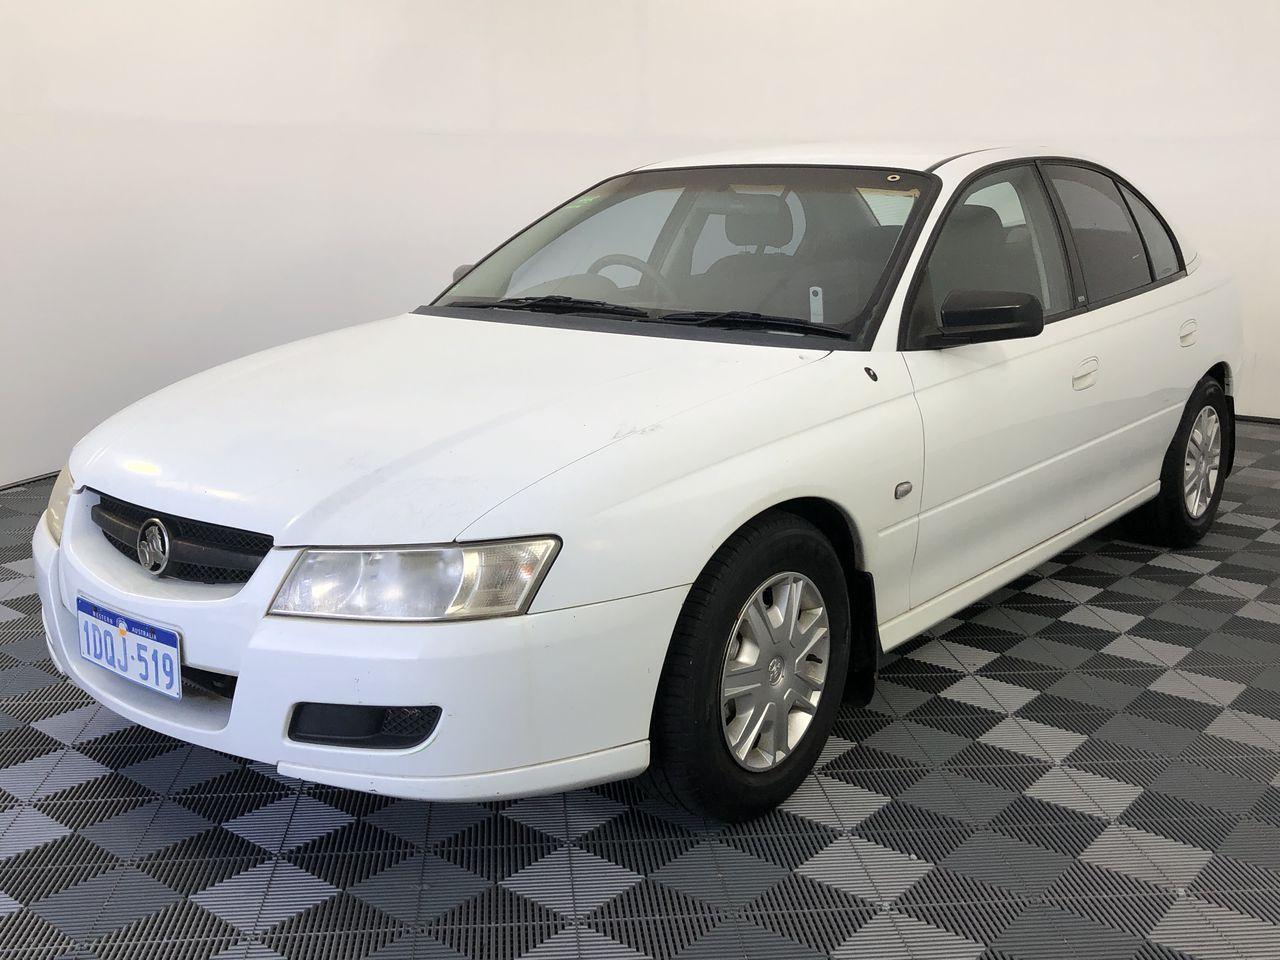 2006 Holden Commodore Executive VZ Automatic Sedan